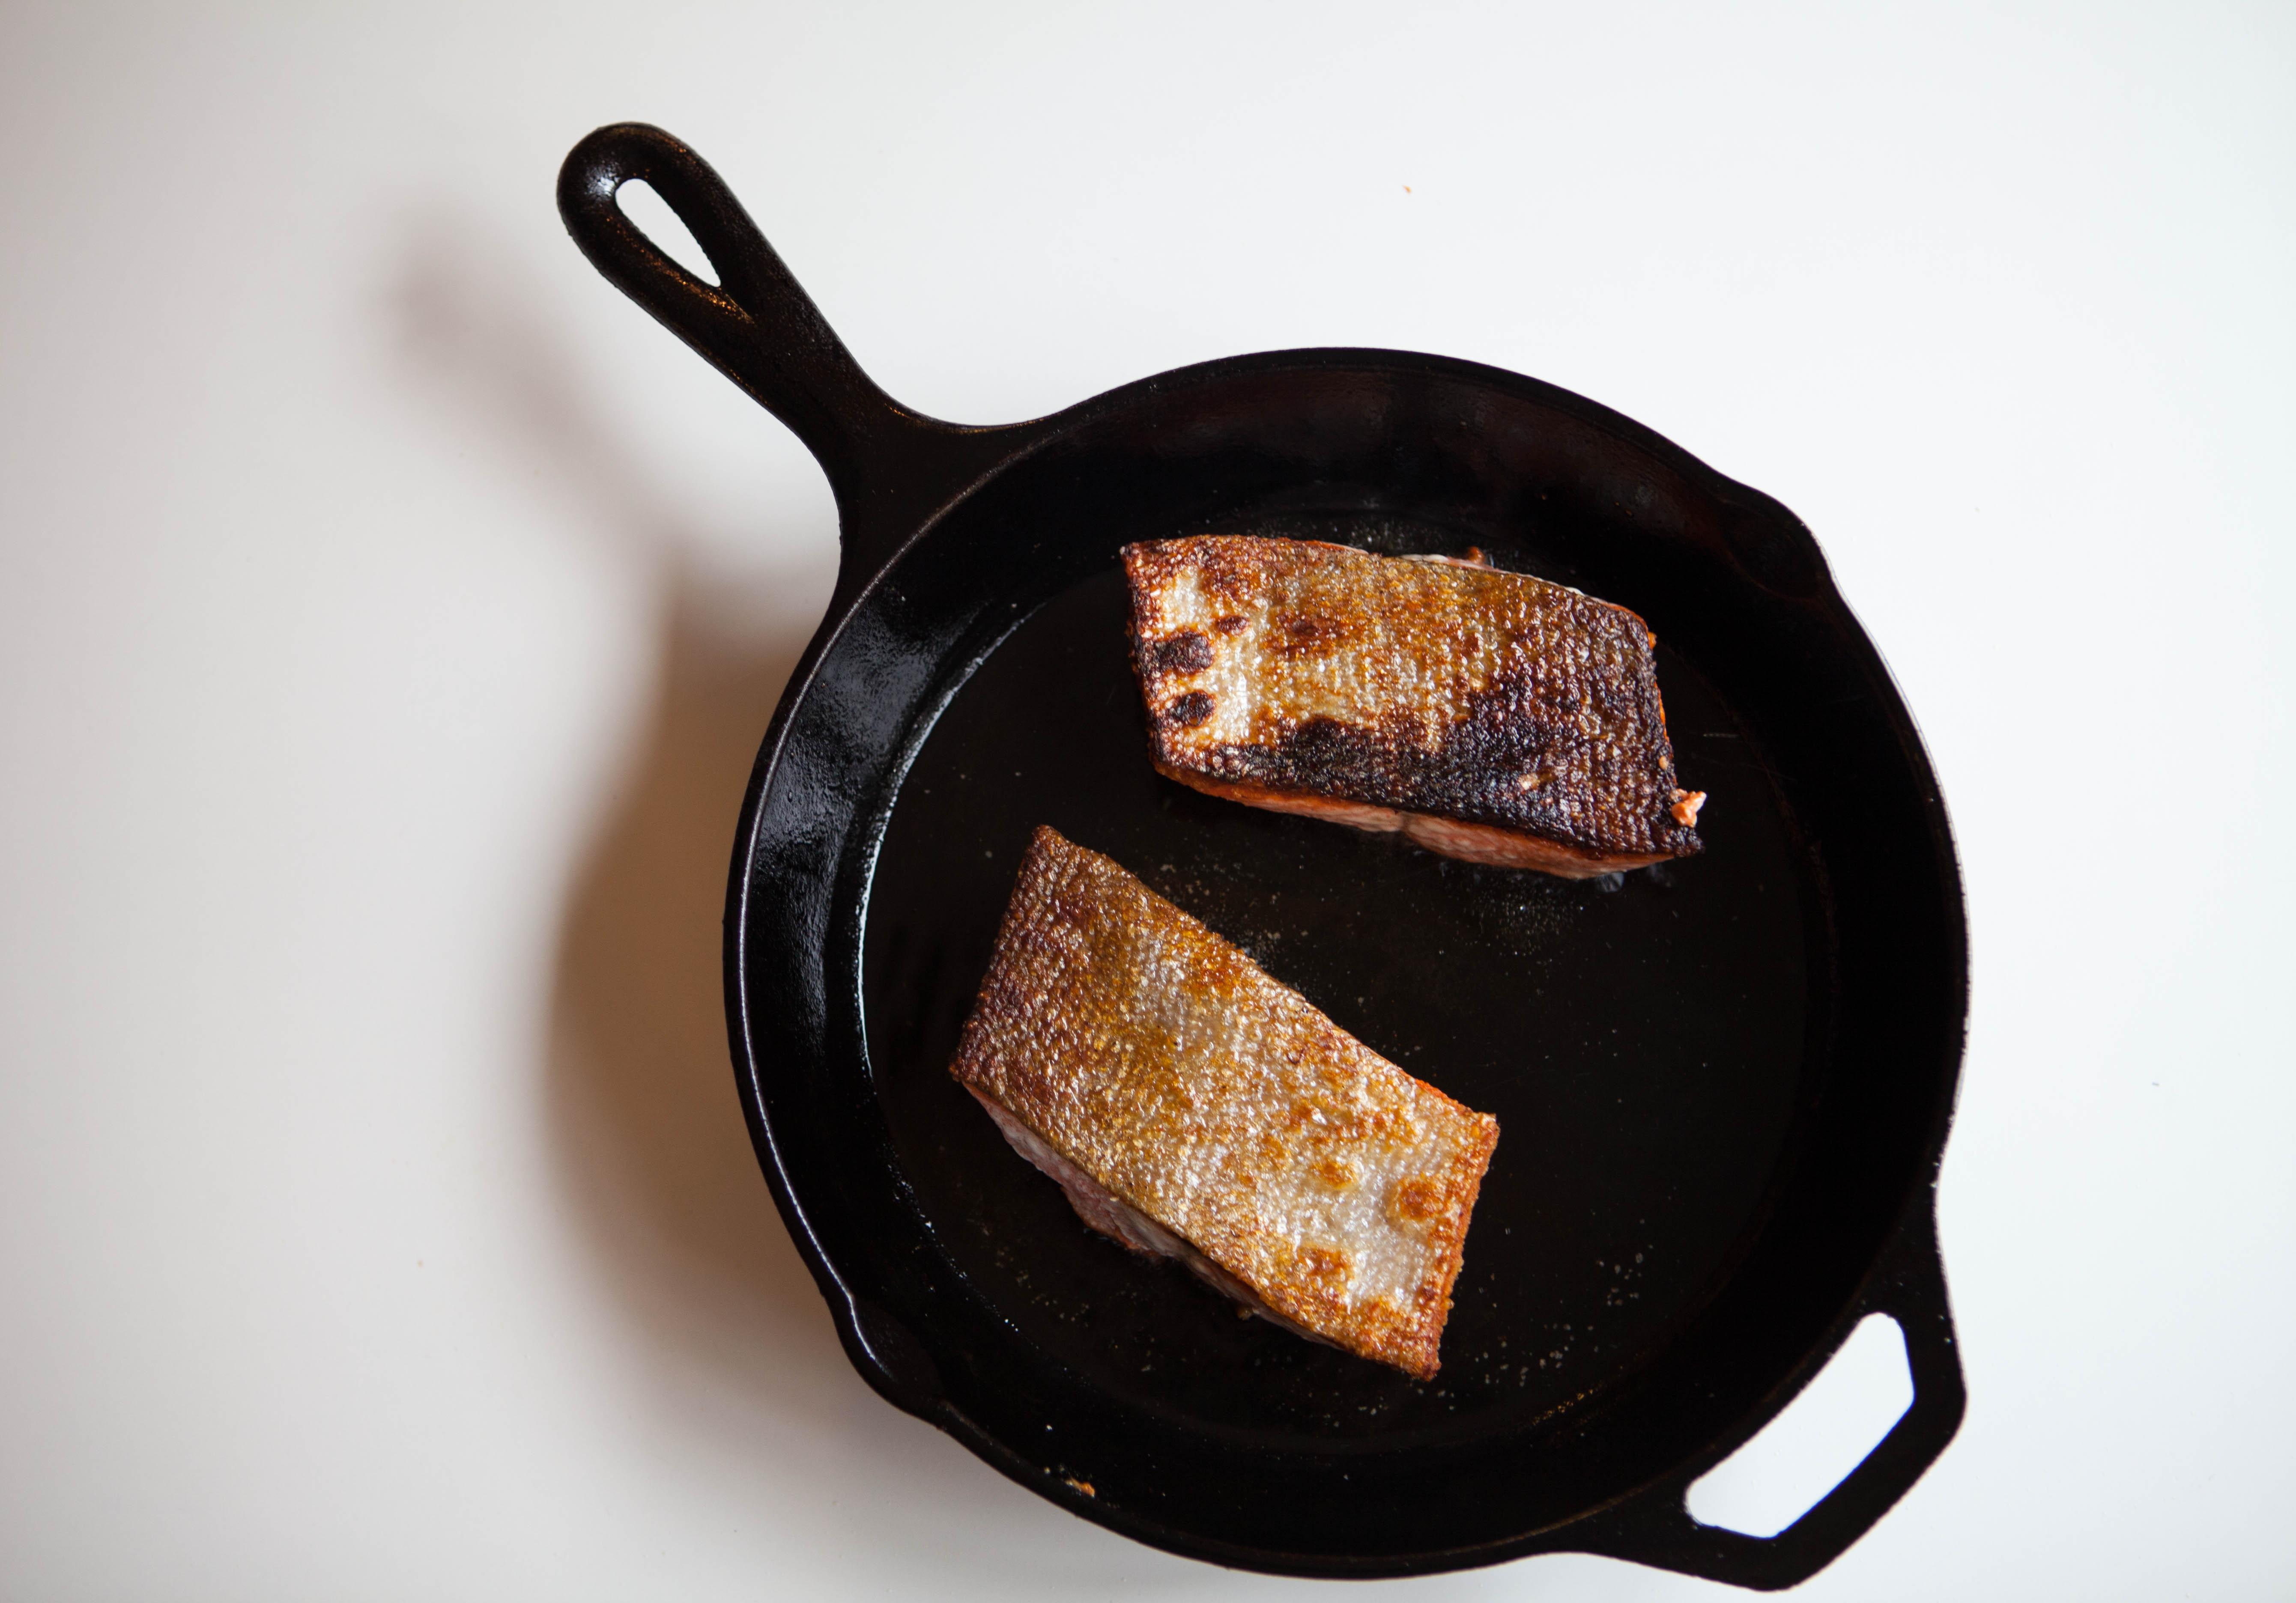 Crispy Skin Salmon | a simple method for cooking wild Alaska salmon from Alaskaknitnat.com